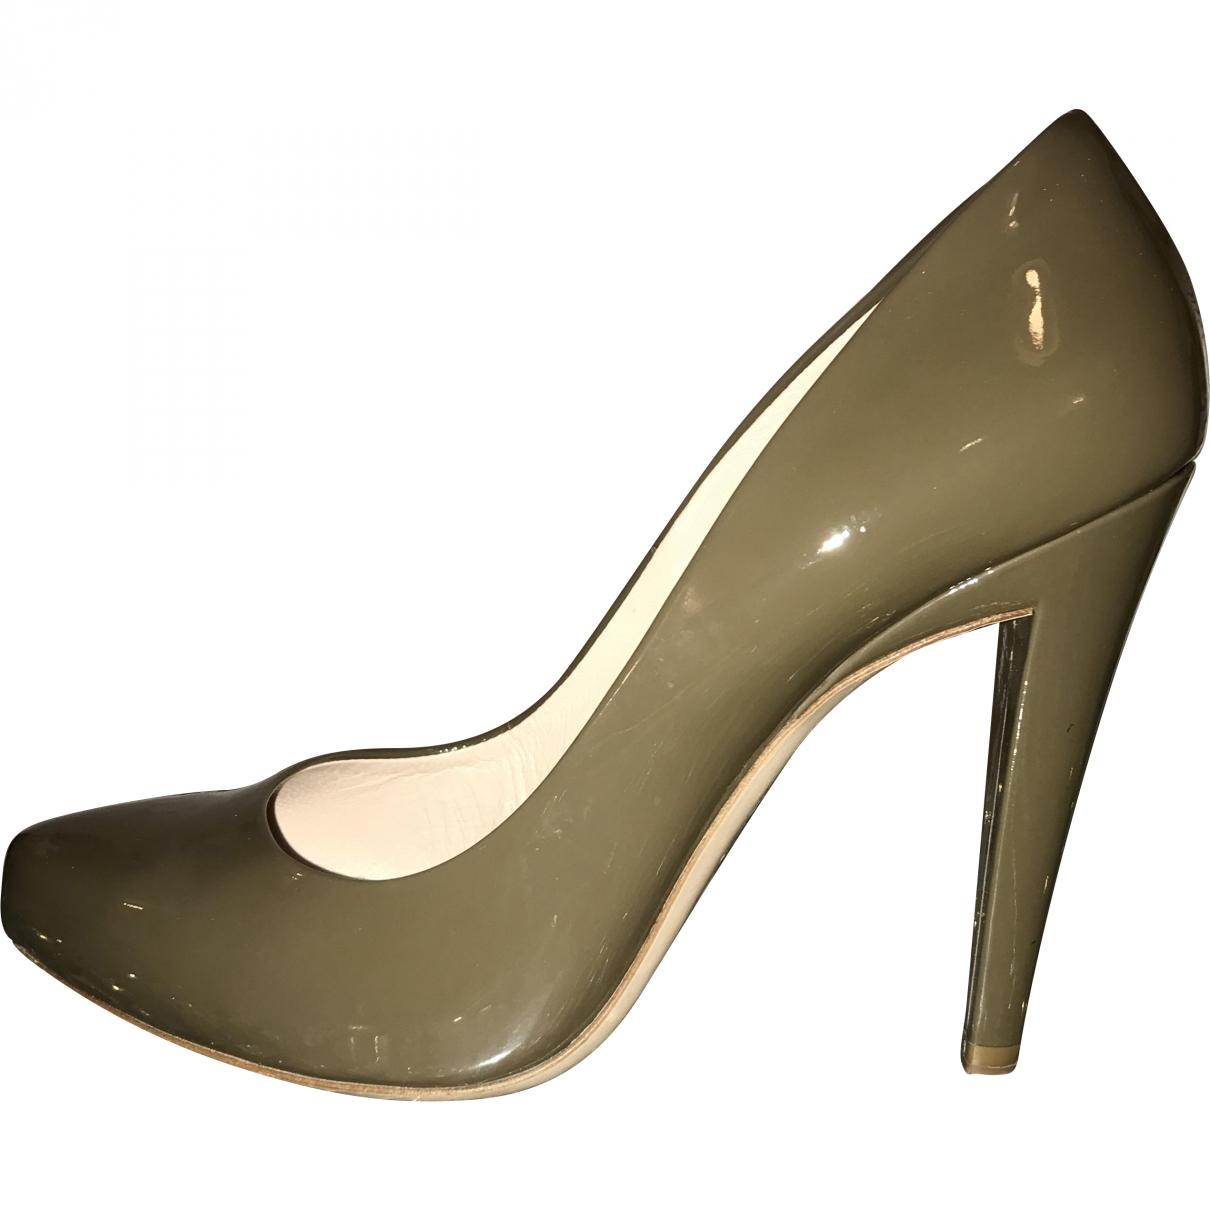 Miu Miu \N Khaki Patent leather Heels for Women 39.5 EU